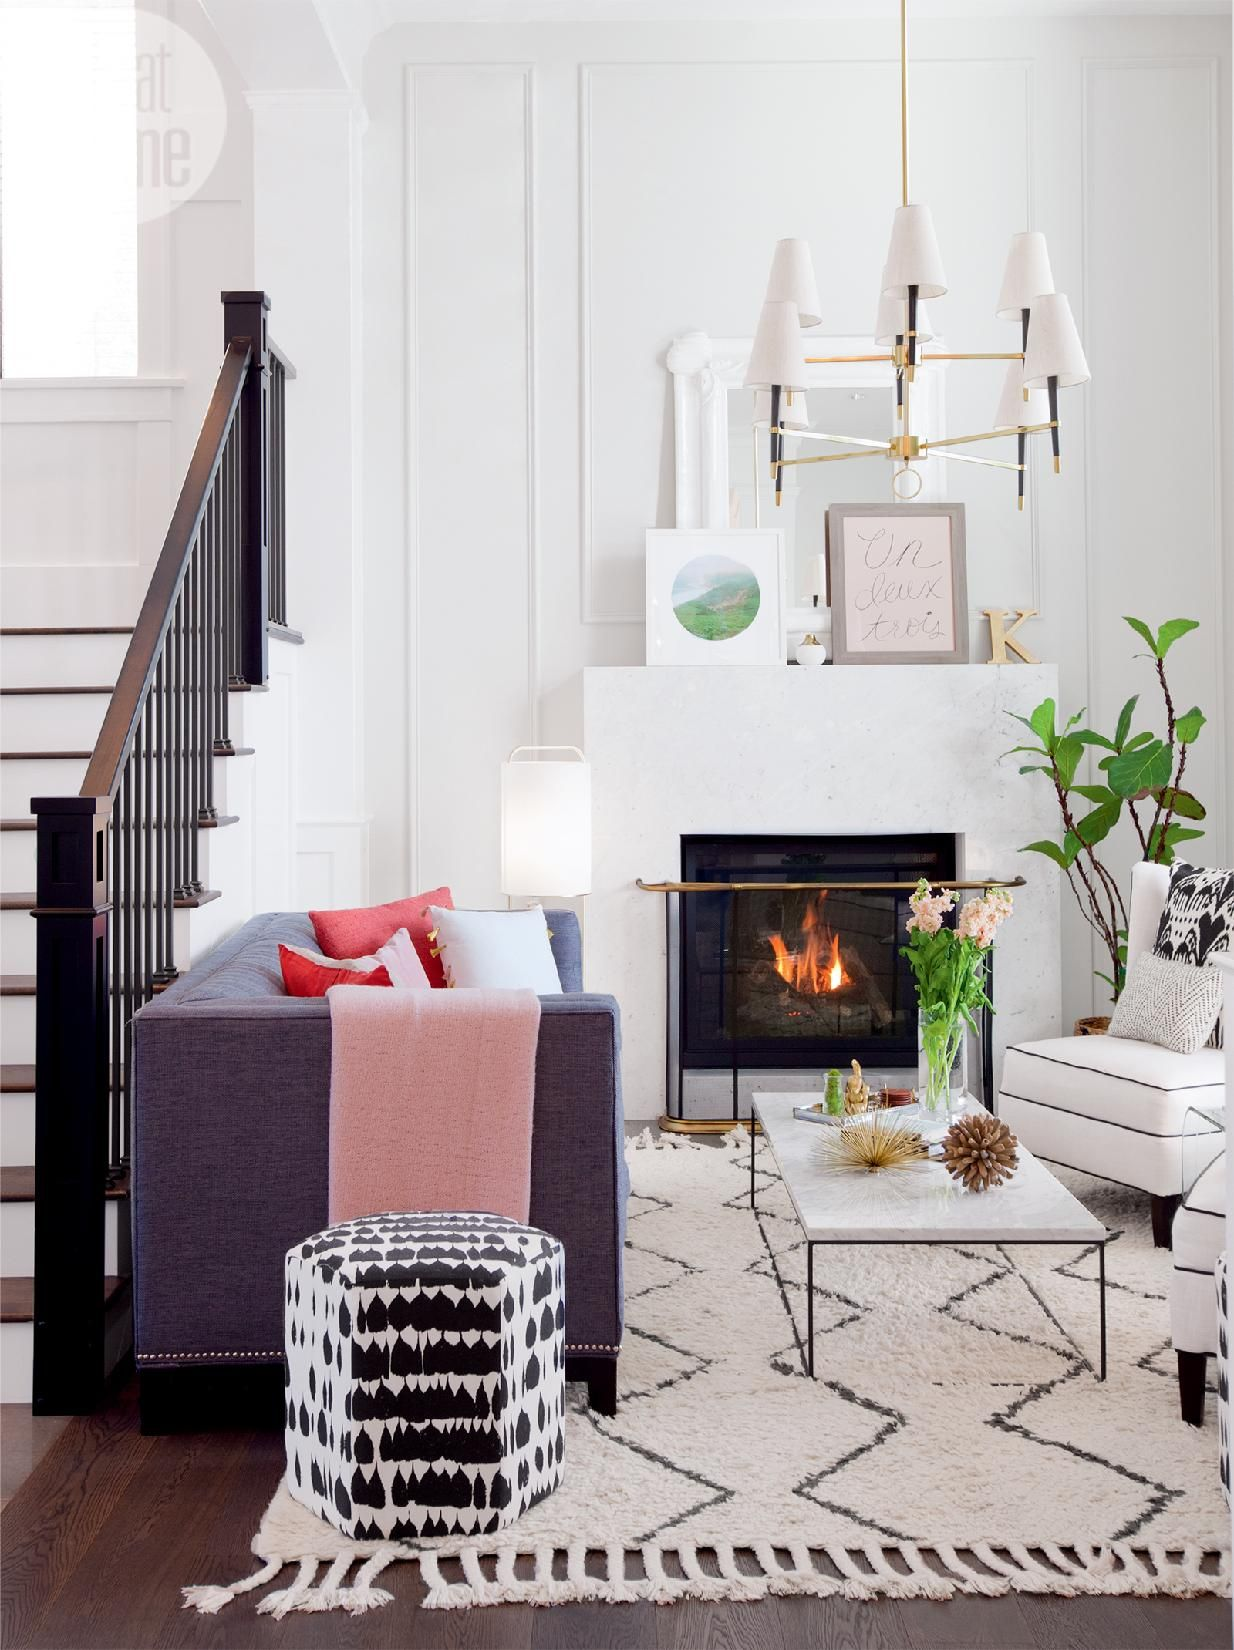 Interiors | House tours, Stylish and Budgeting